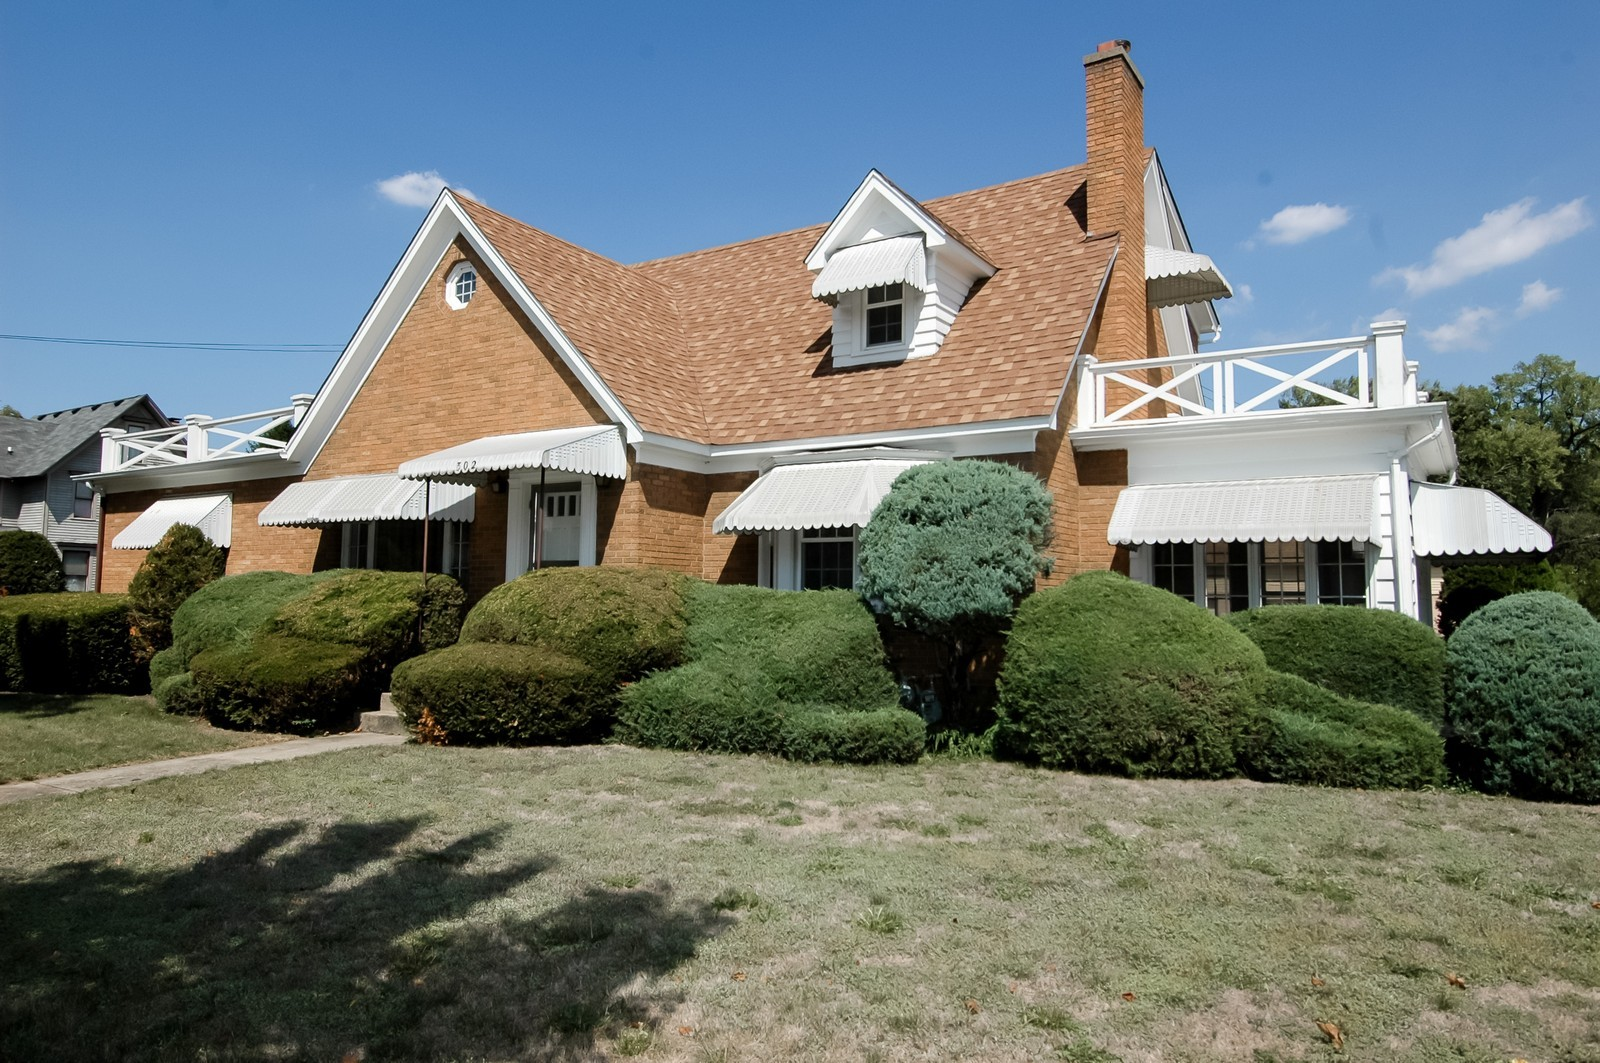 Real Estate Photography - 302 Washington, Algonquin, IL, 60102 - Front View